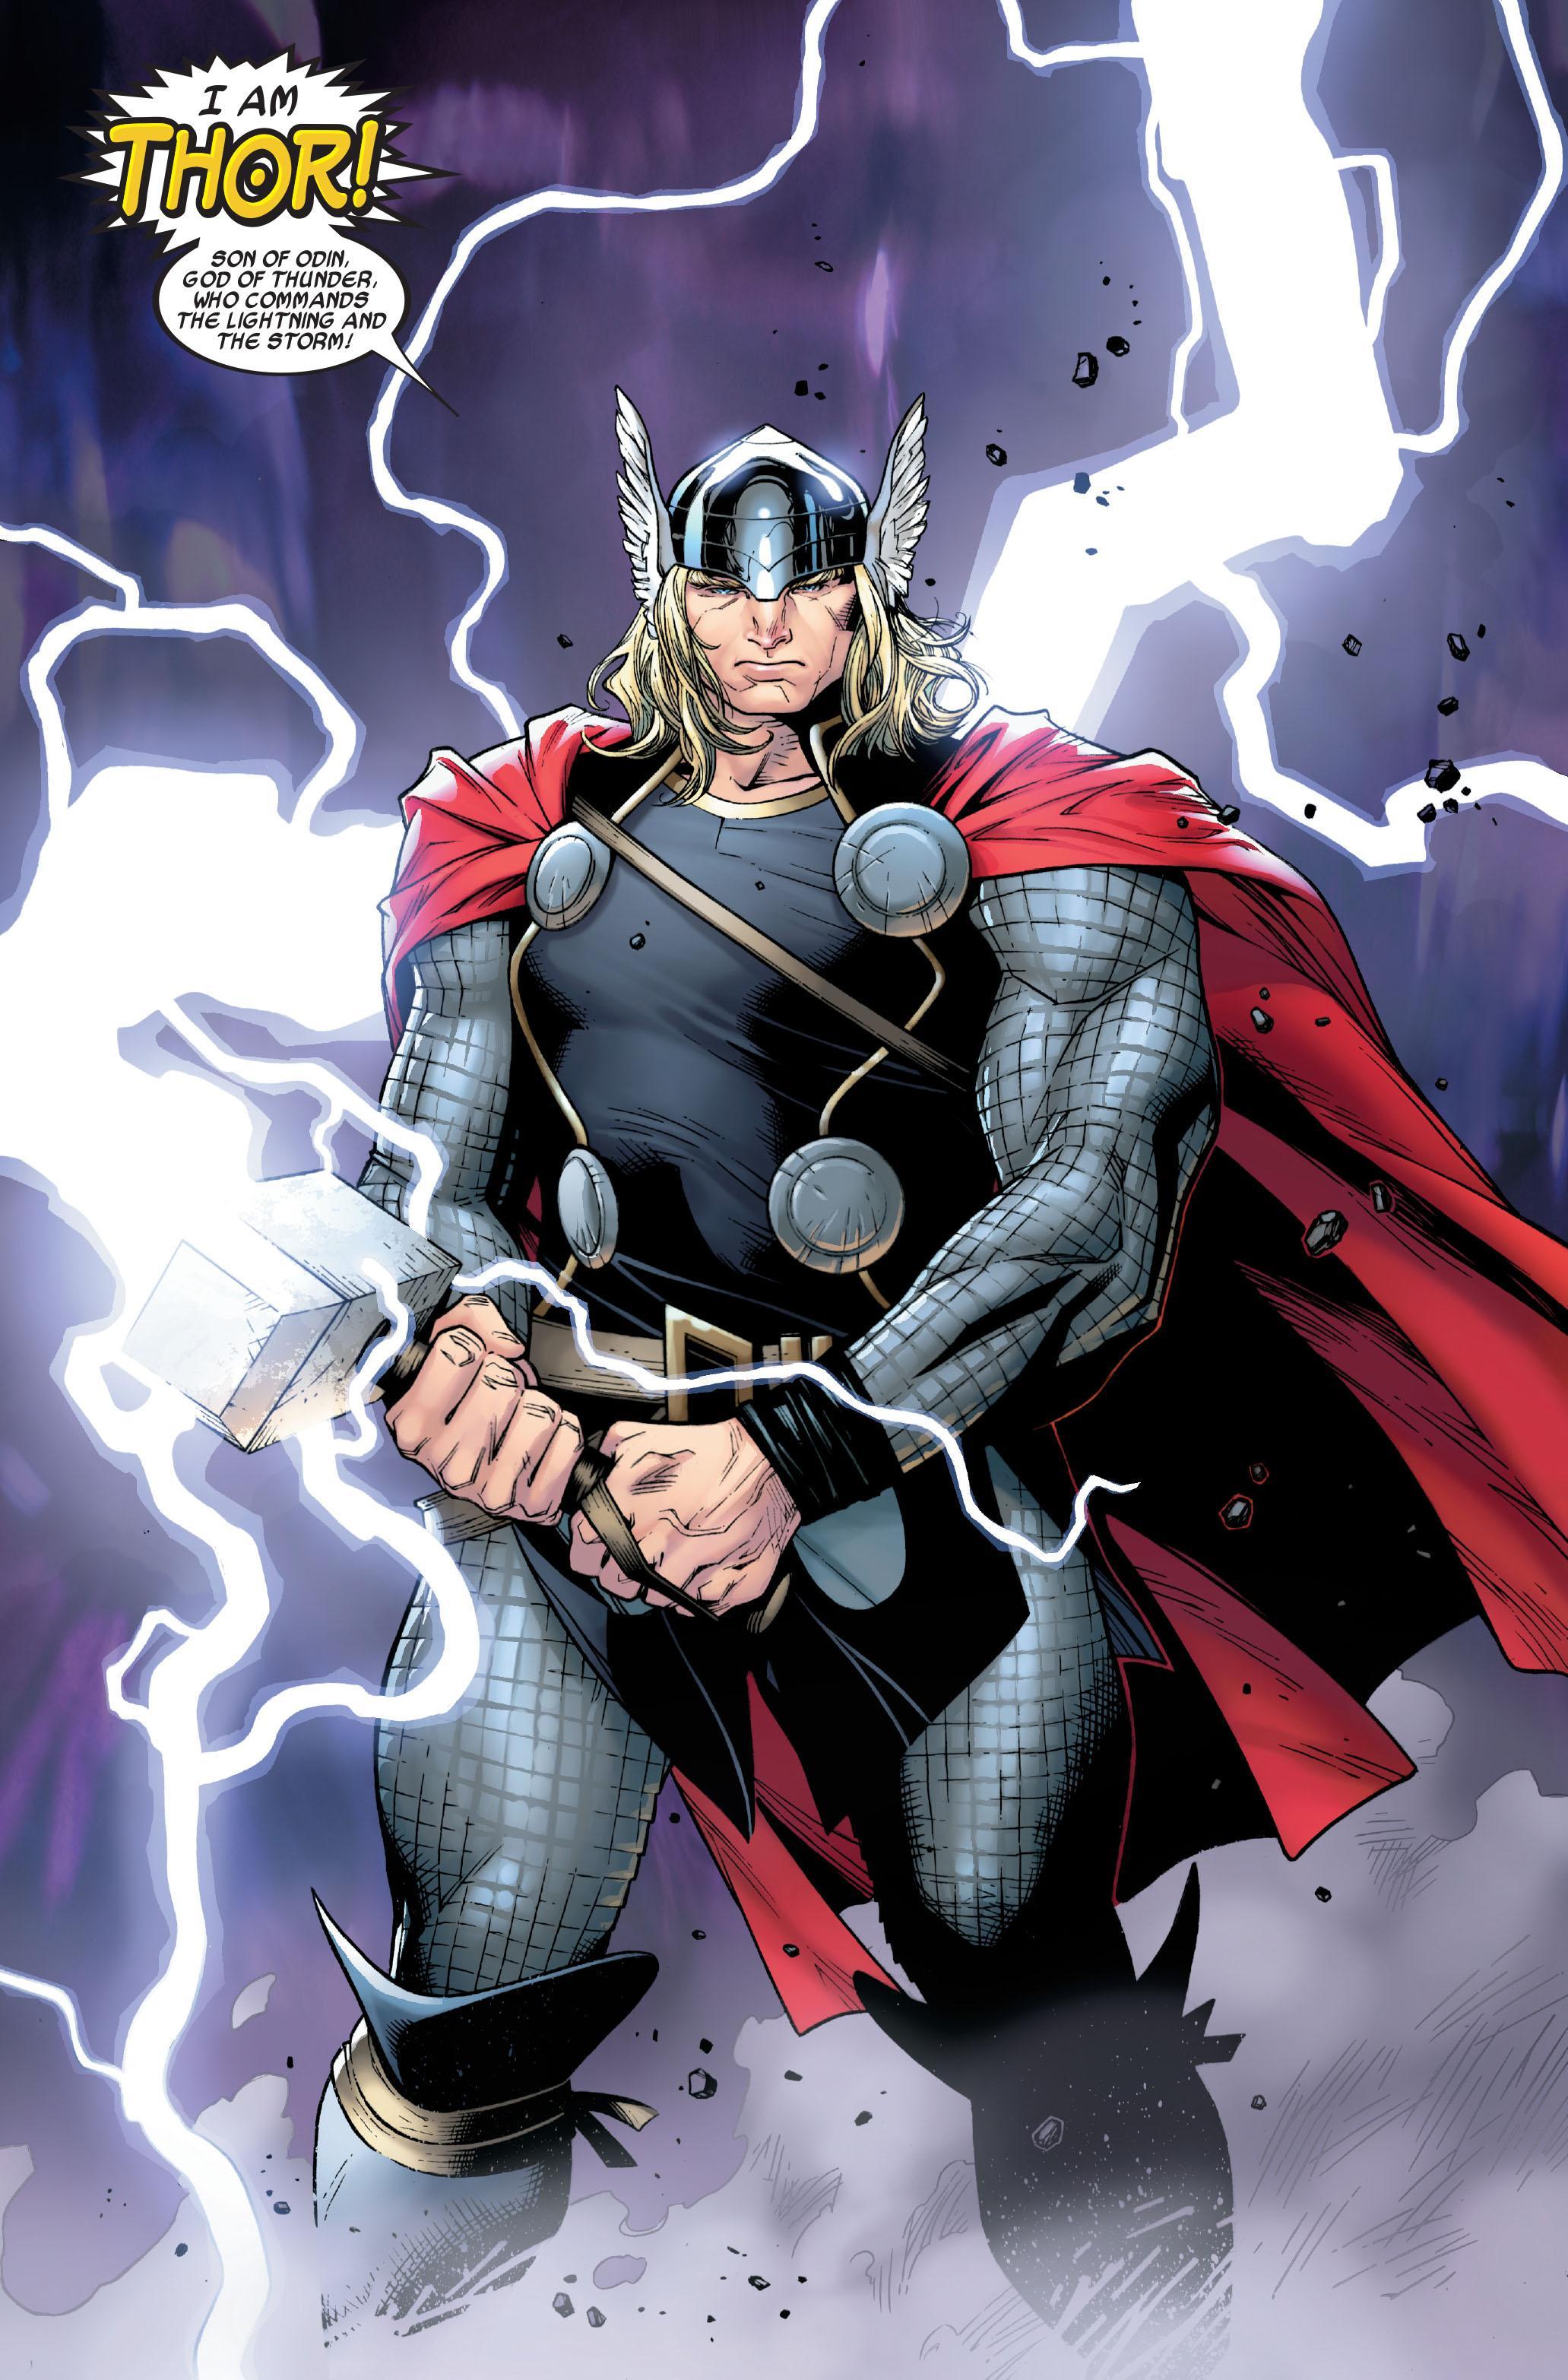 Thor By J. Michael Straczynski Vol. 01 review